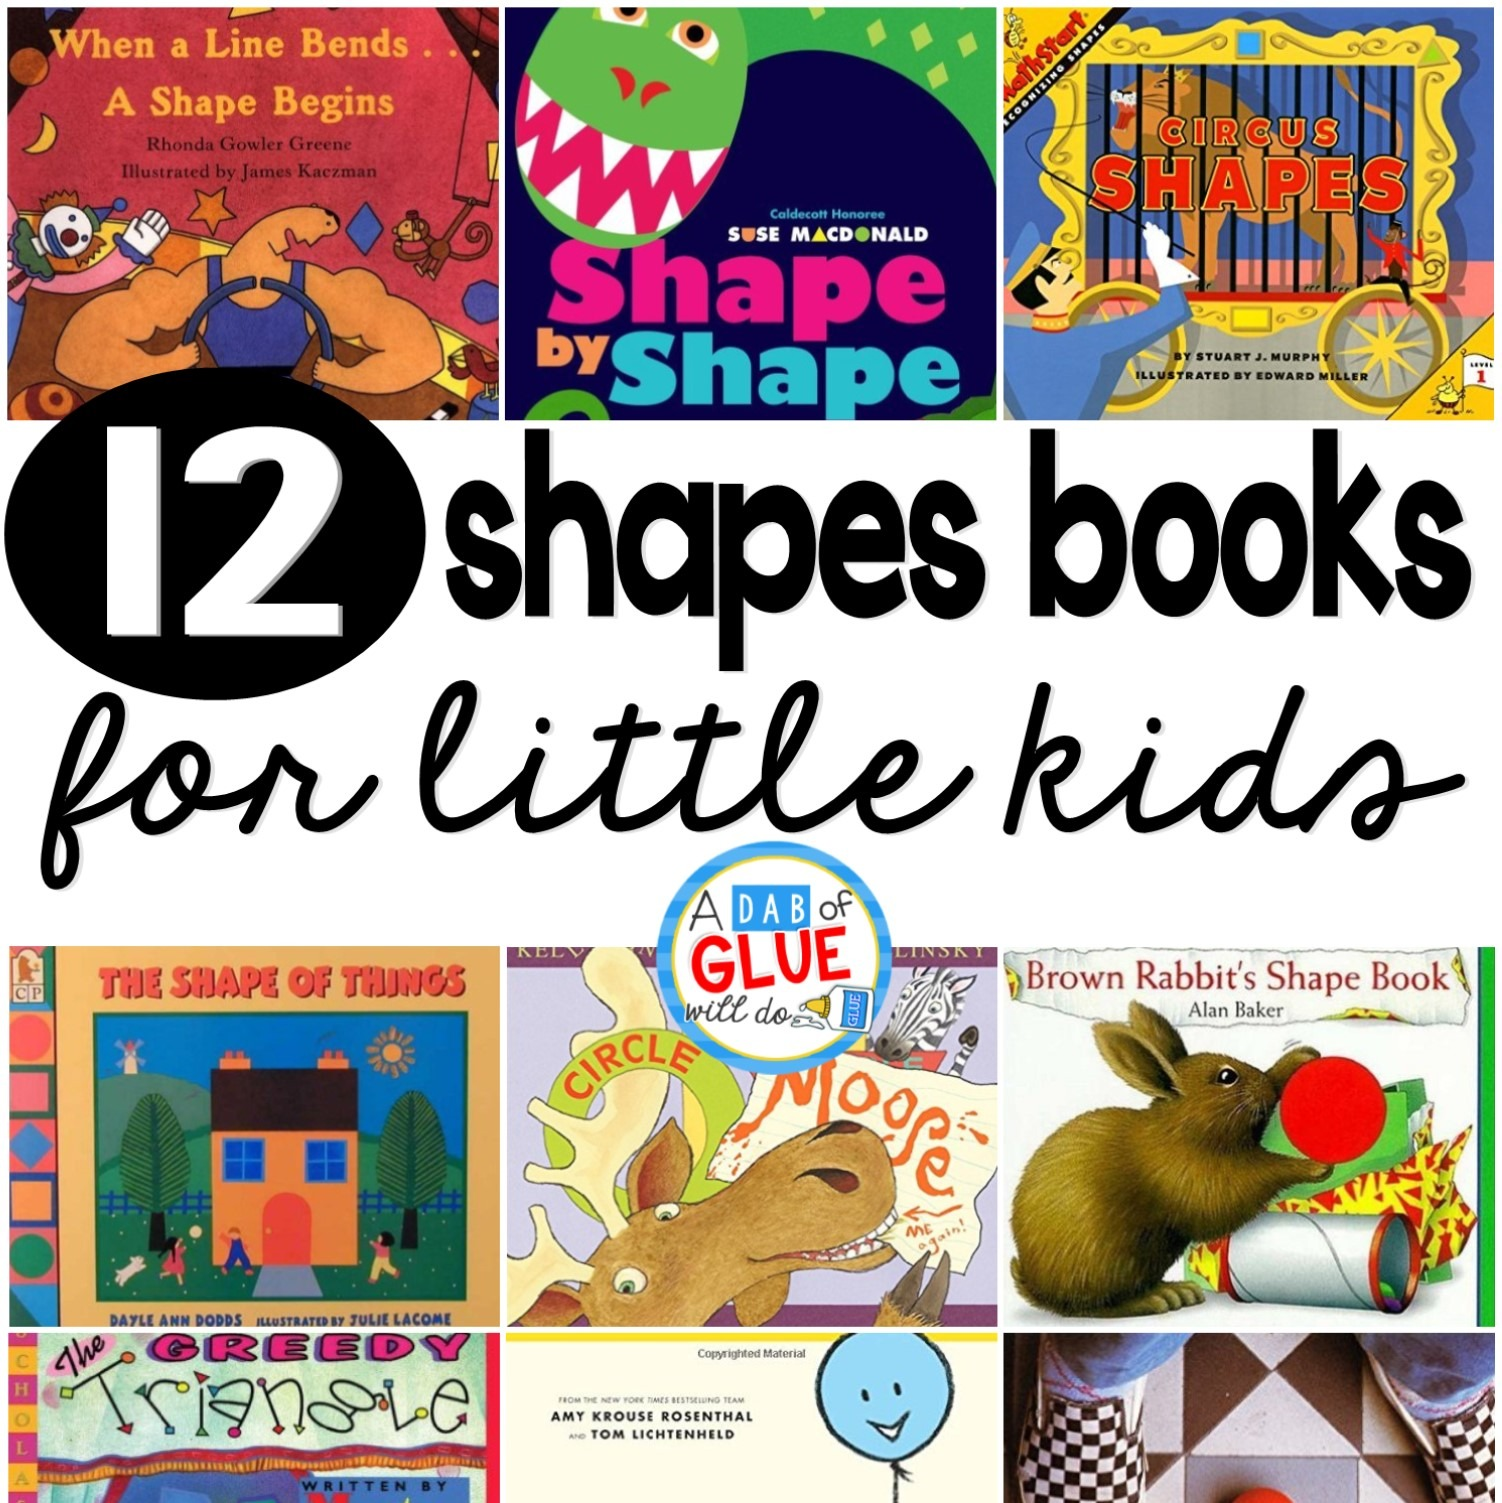 12 Shapes Books For Little Kids